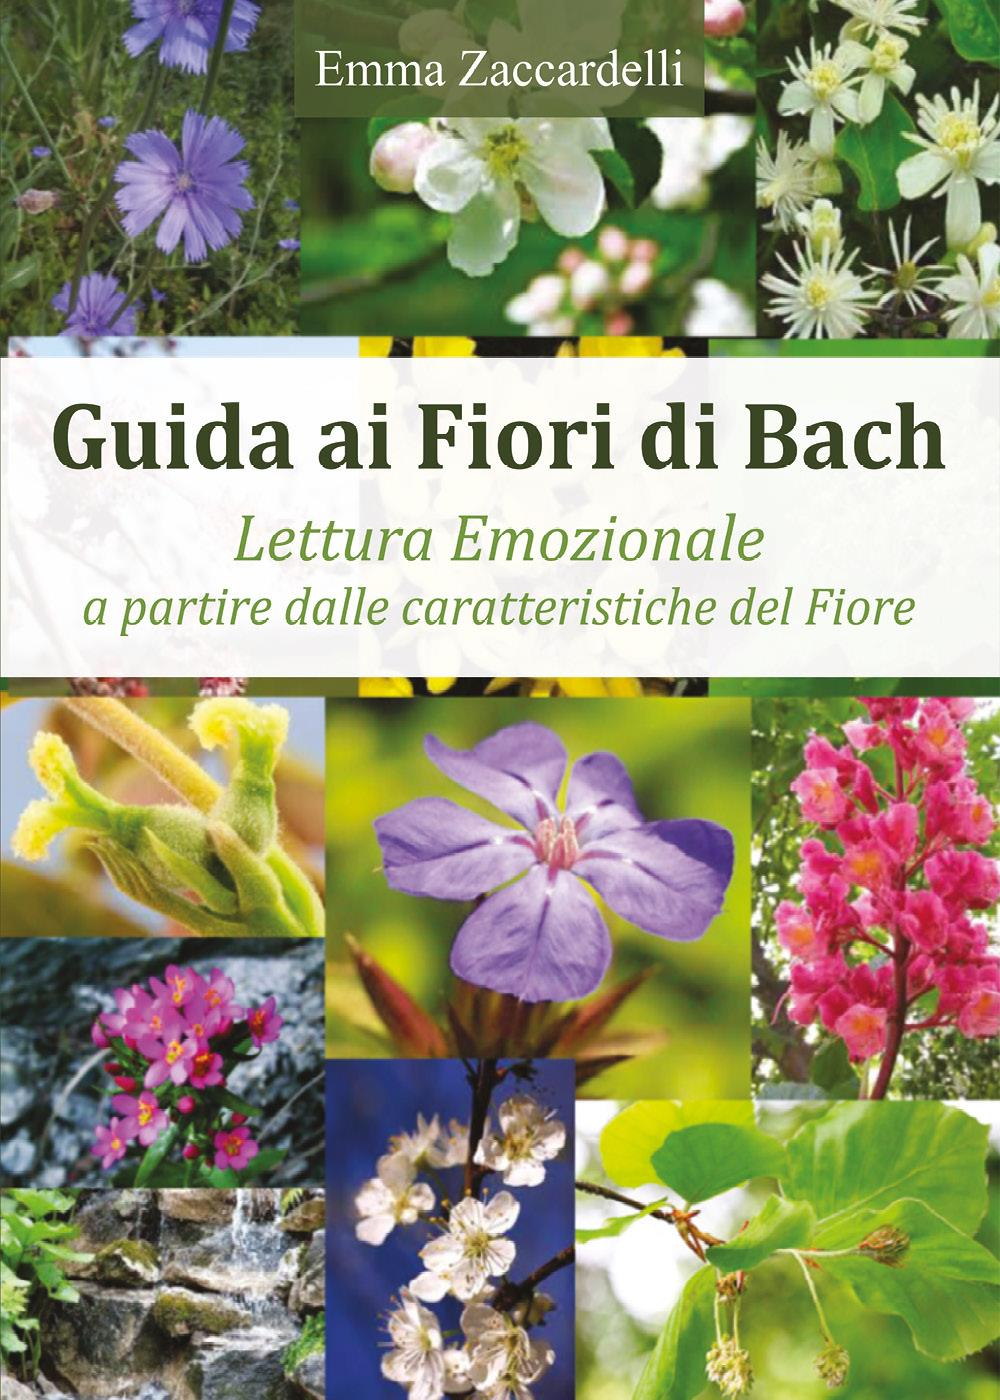 Guida ai fiori di Bach